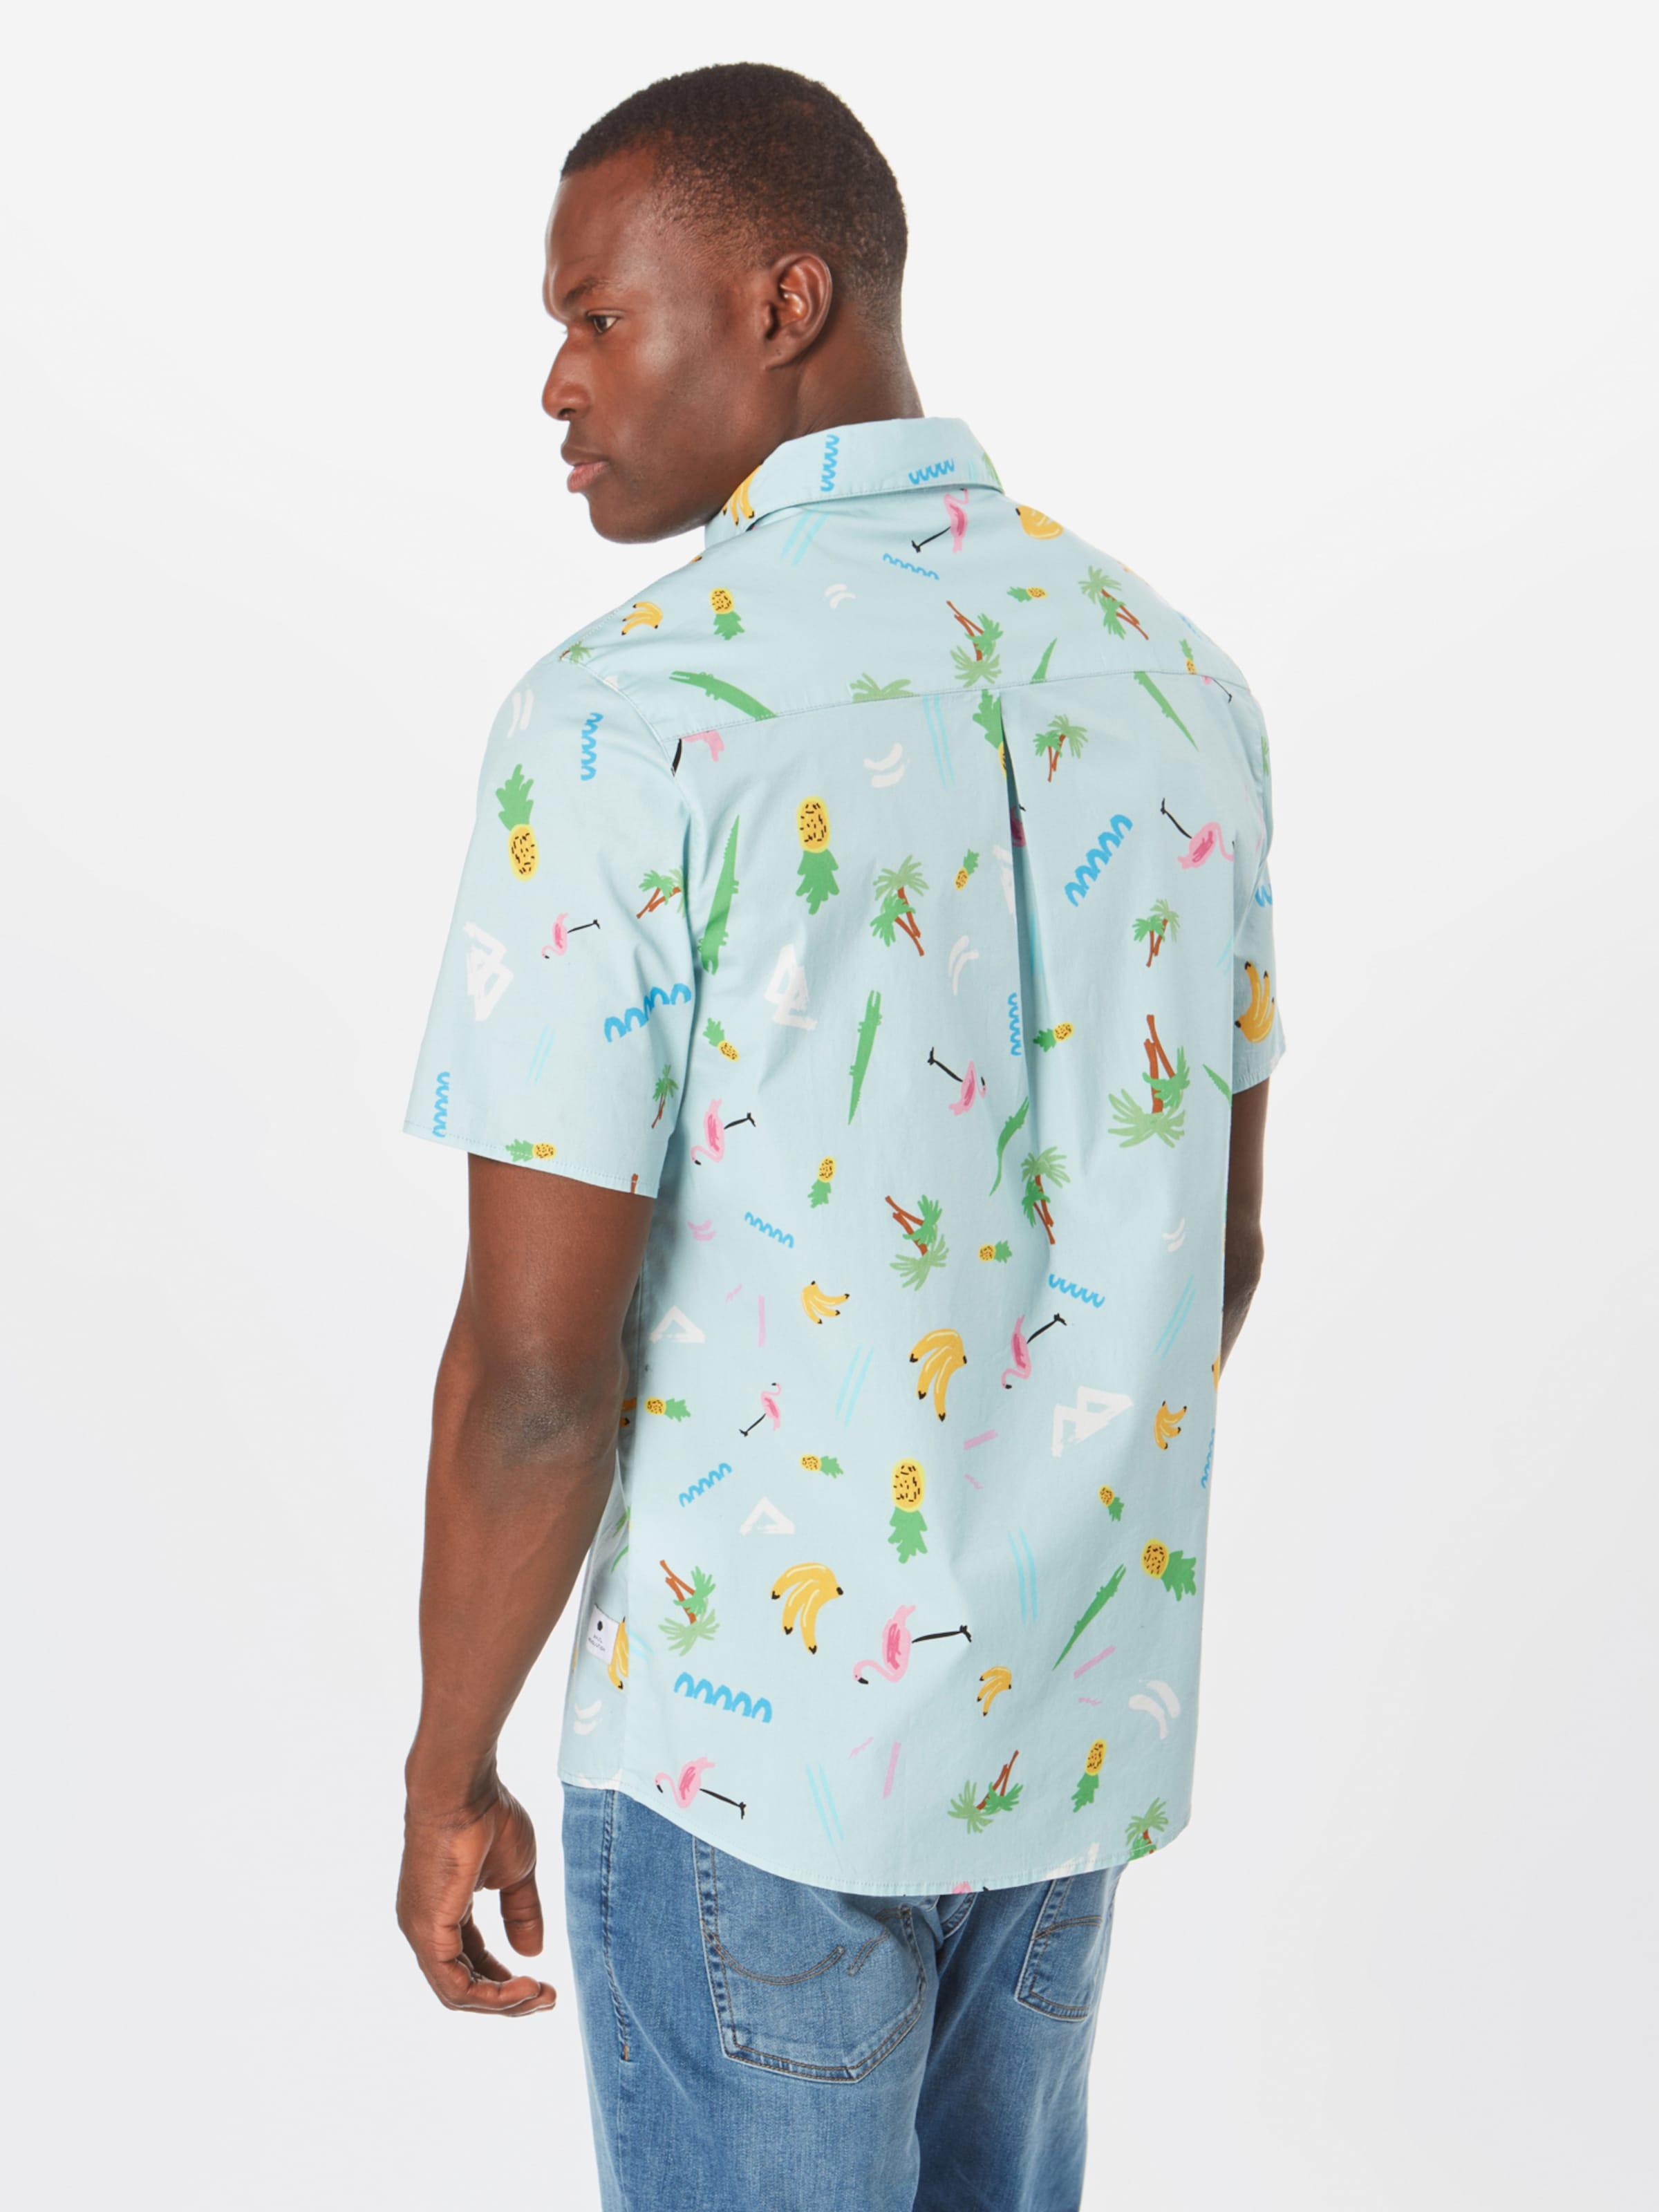 Shirt' HellblauMischfarben Hemd Revolution 'nicolas In wm8NOyv0Pn